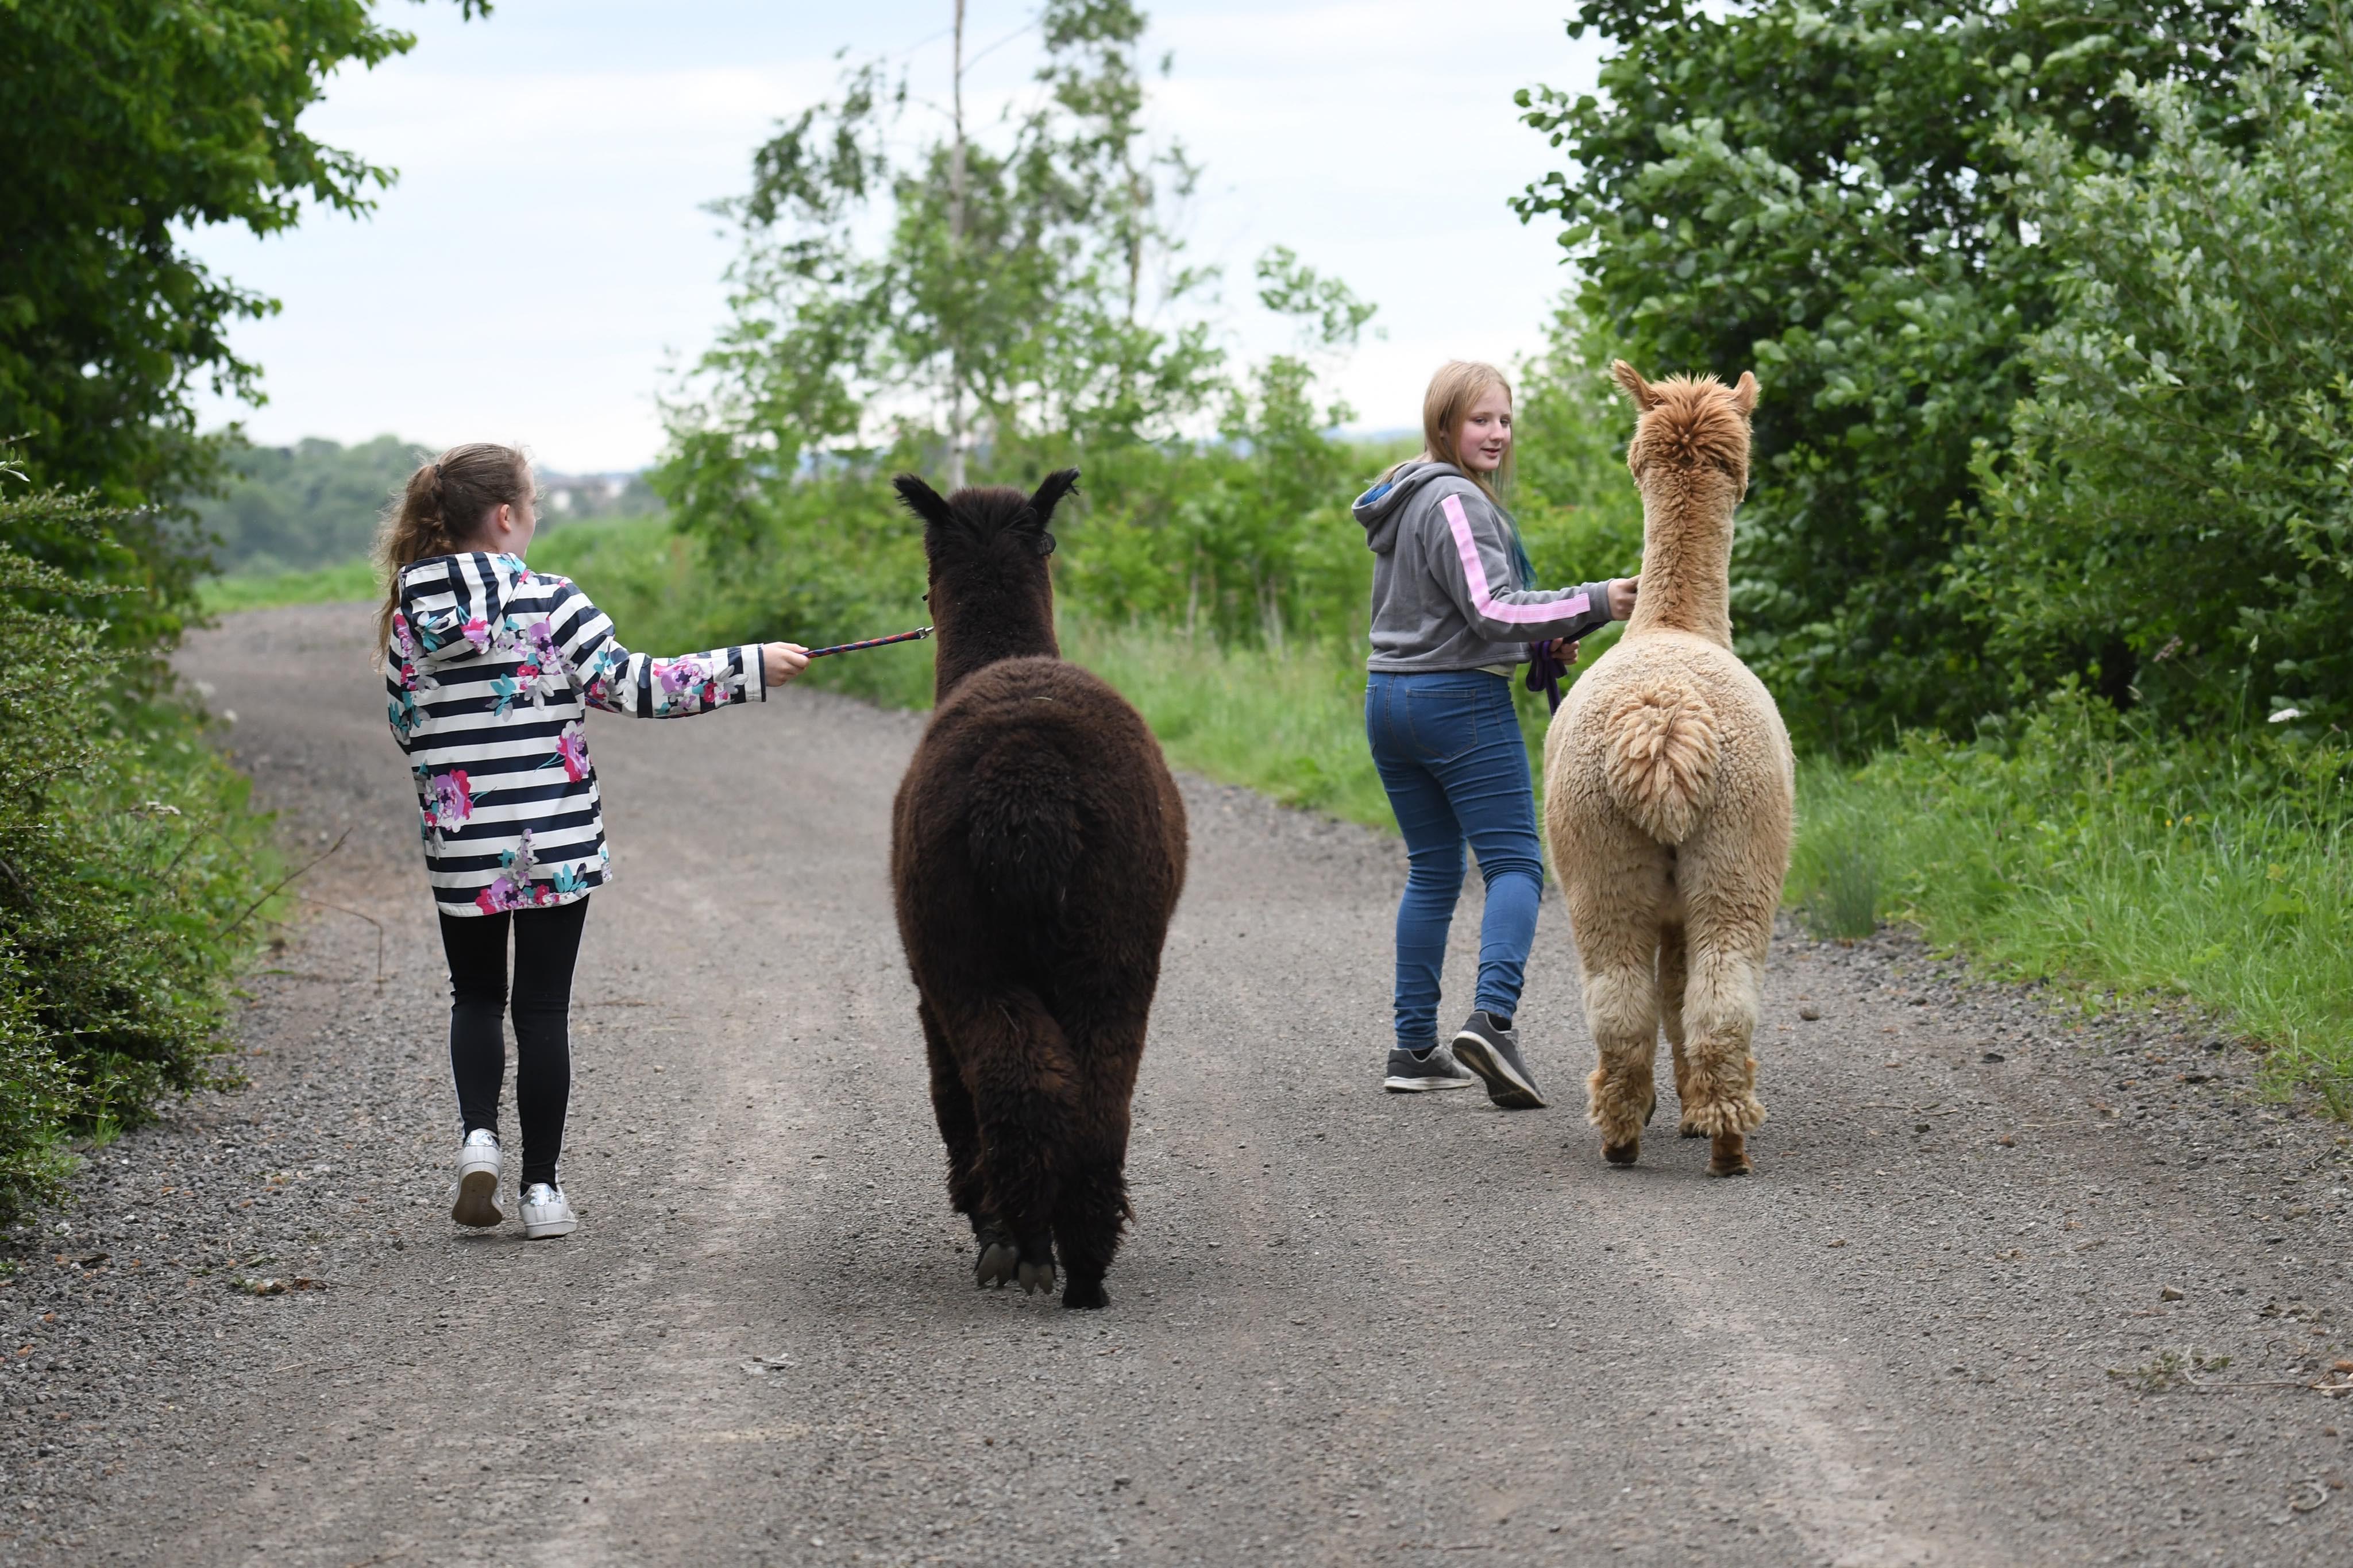 Group alpaca walking experience